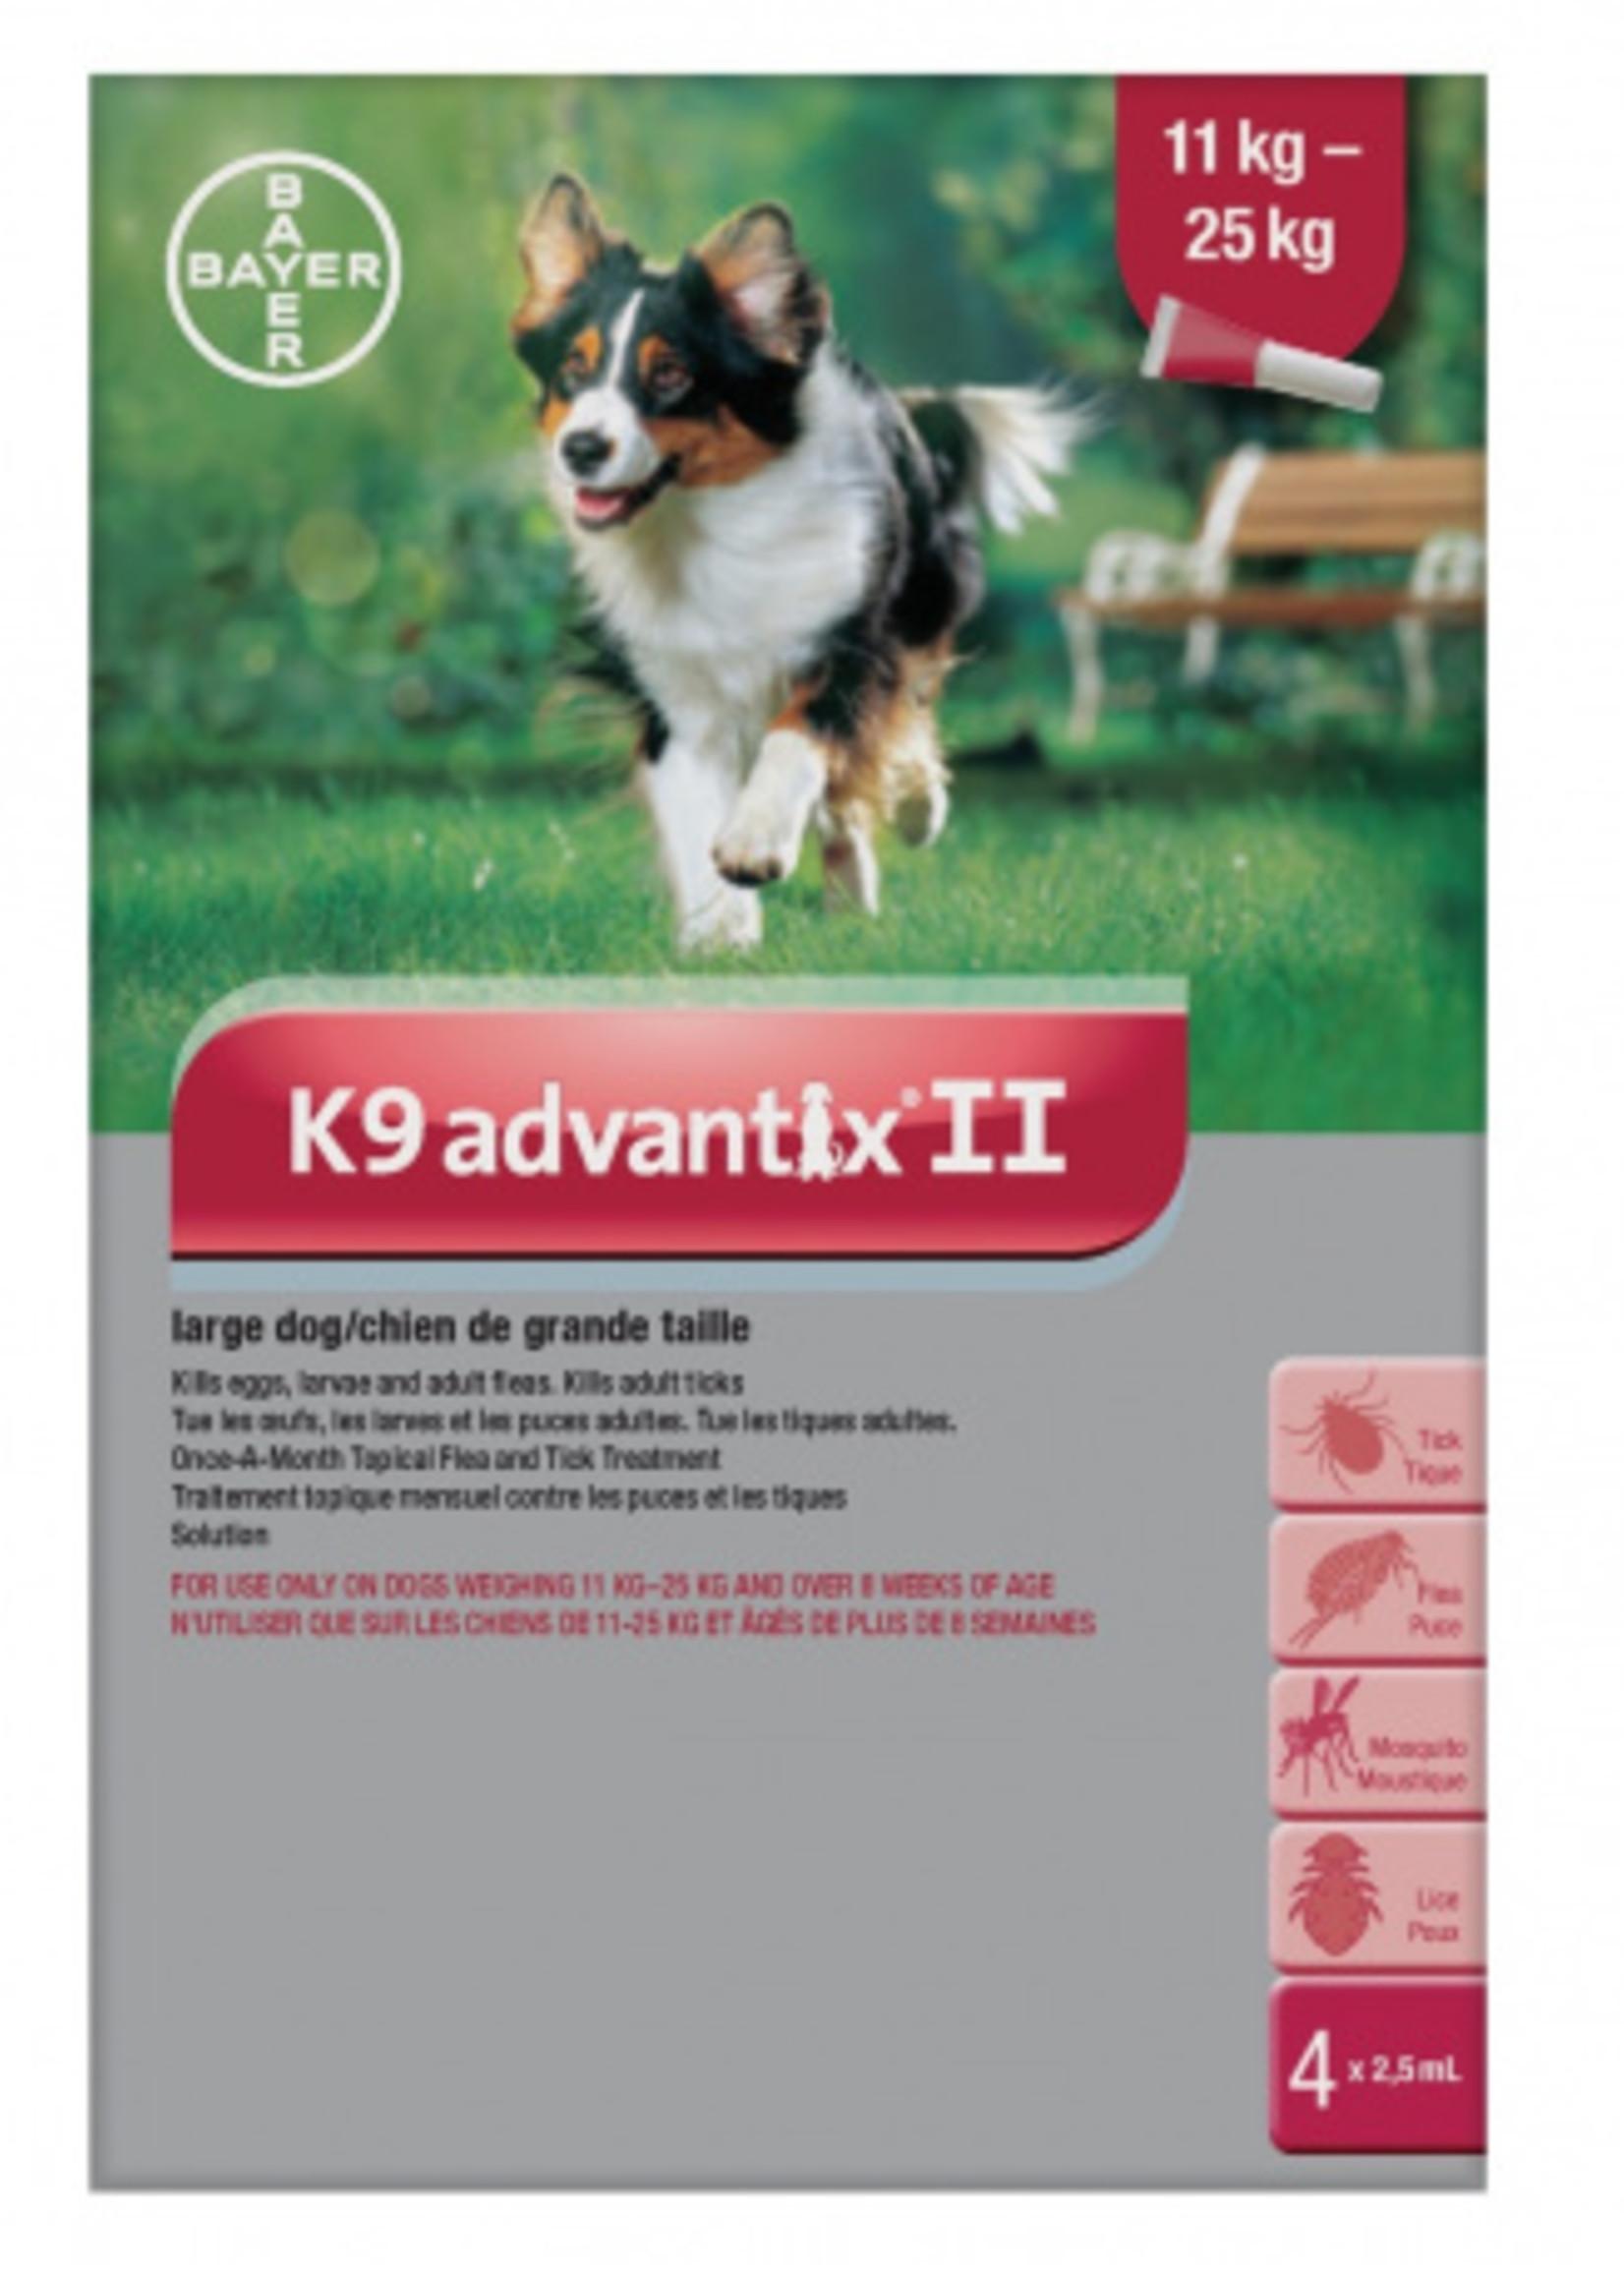 Bayer K9 Advantix® II - Large Dog